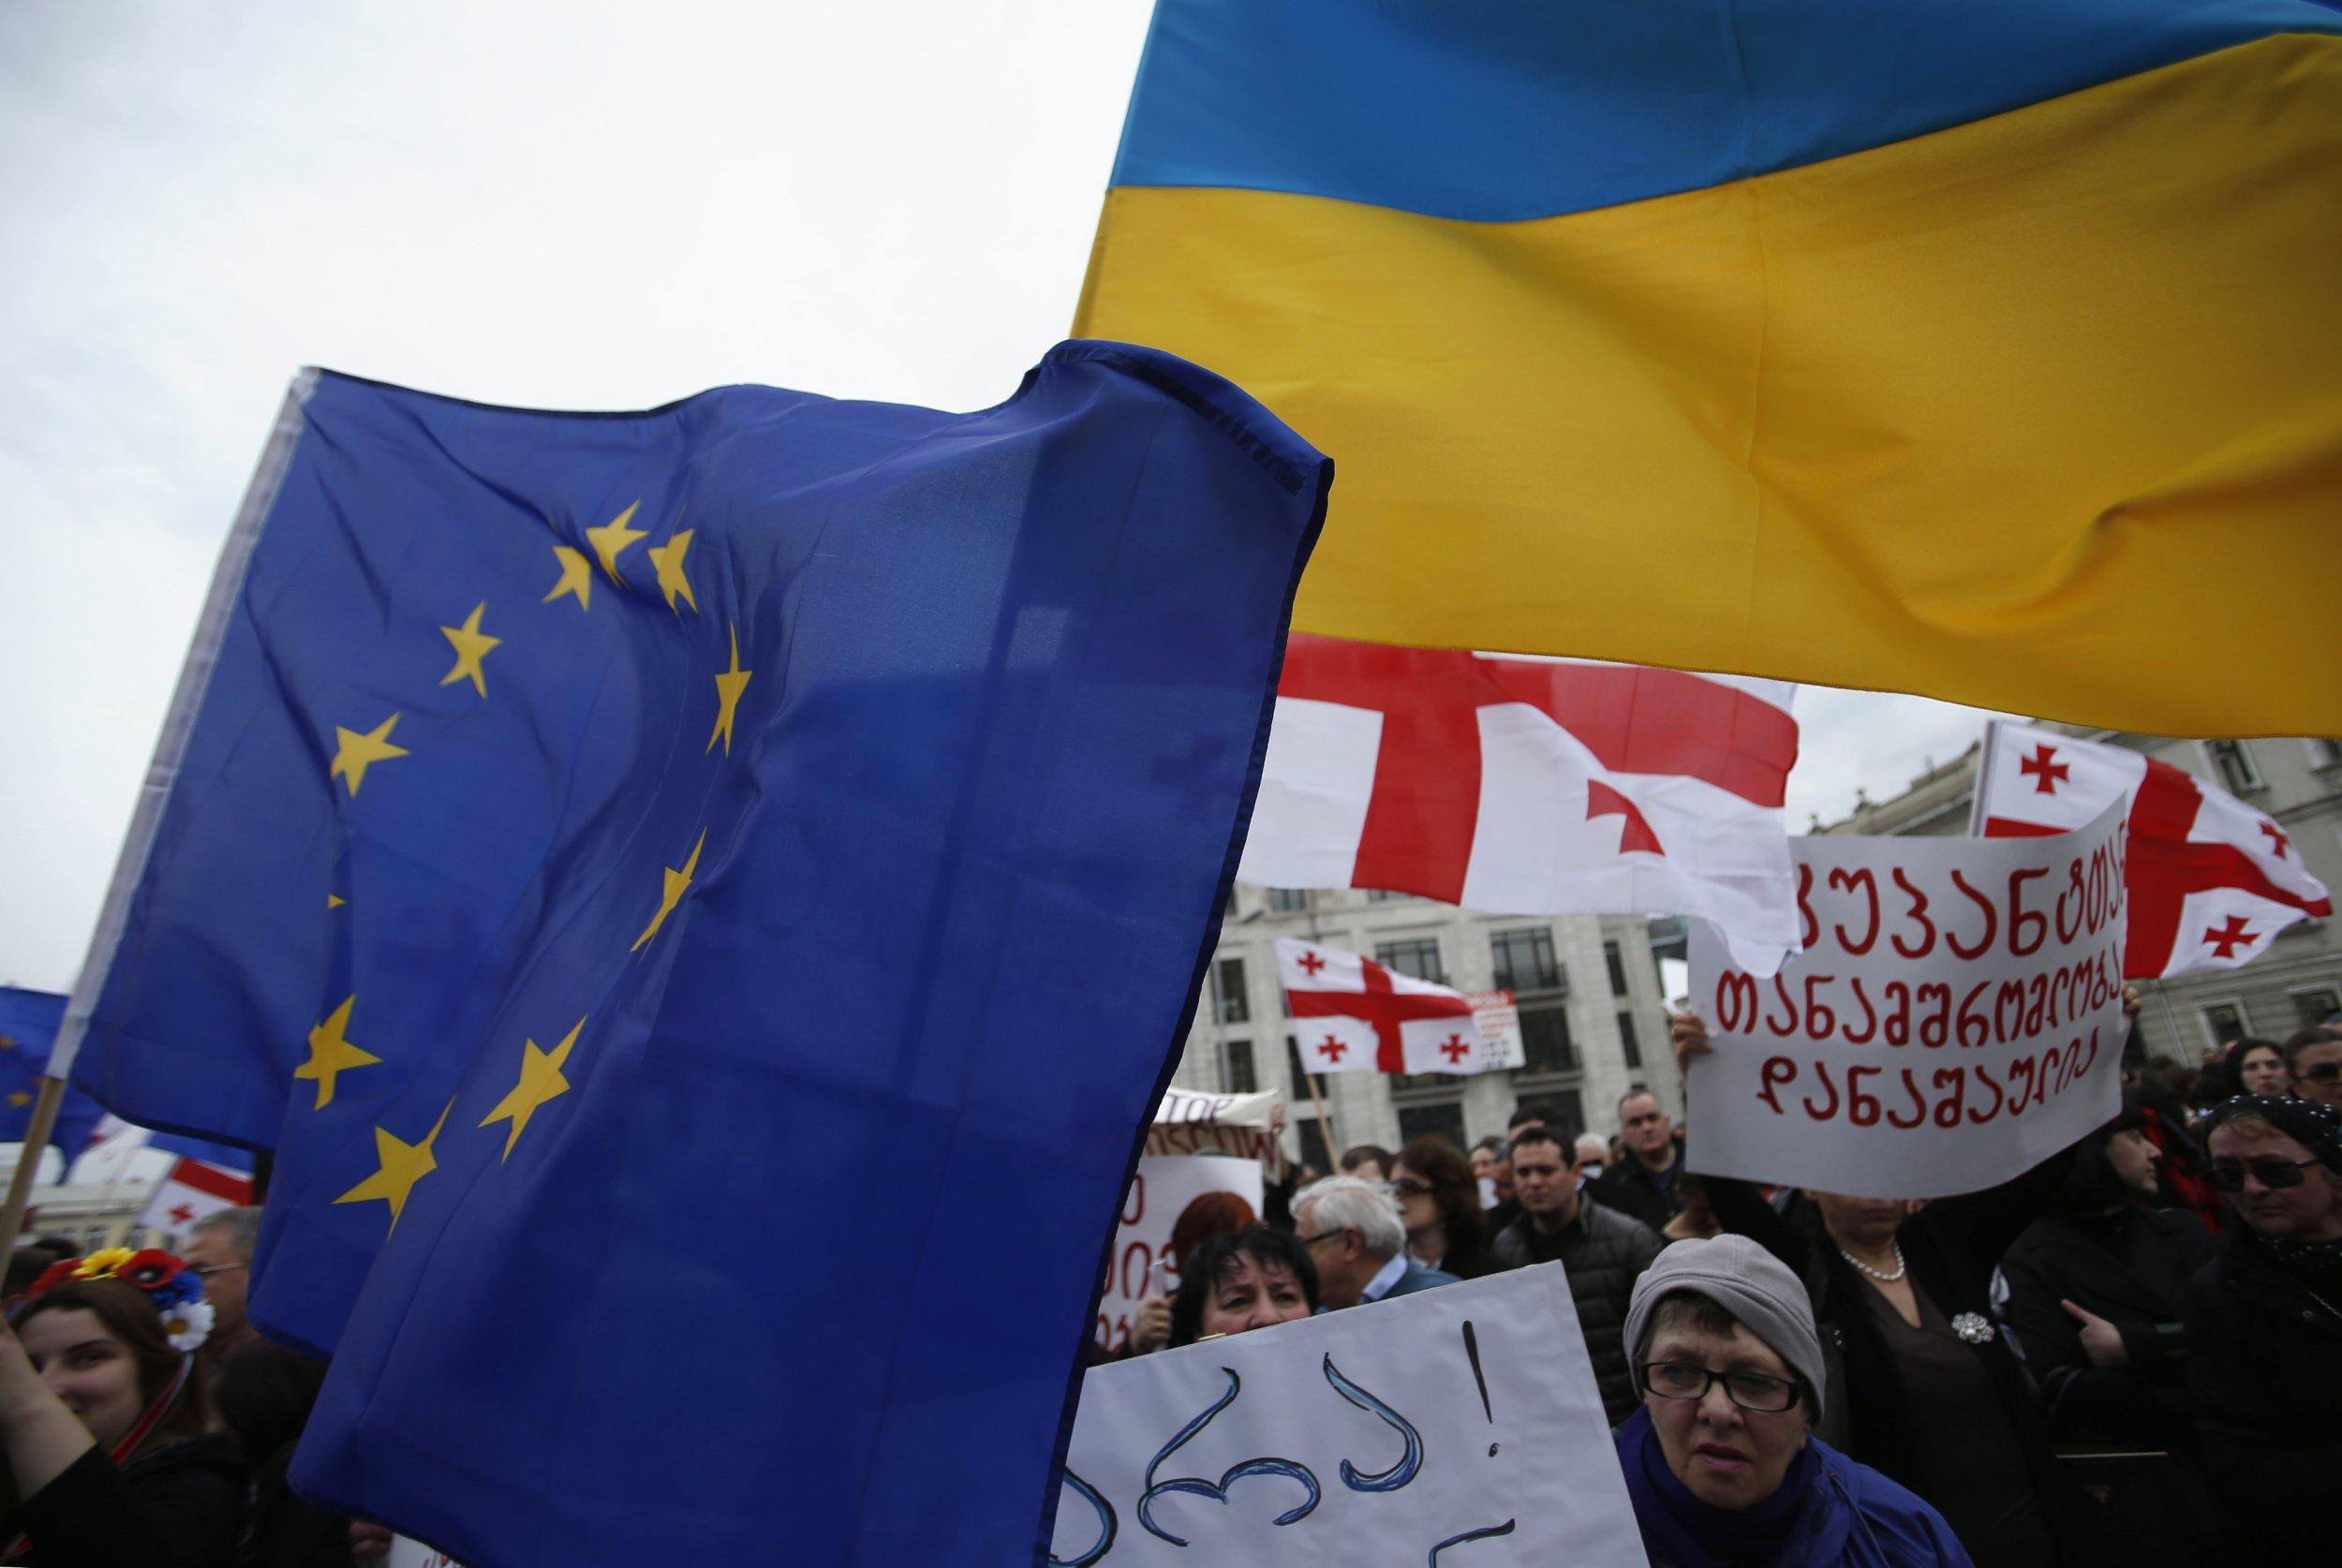 Ukrainian and Georgian flags